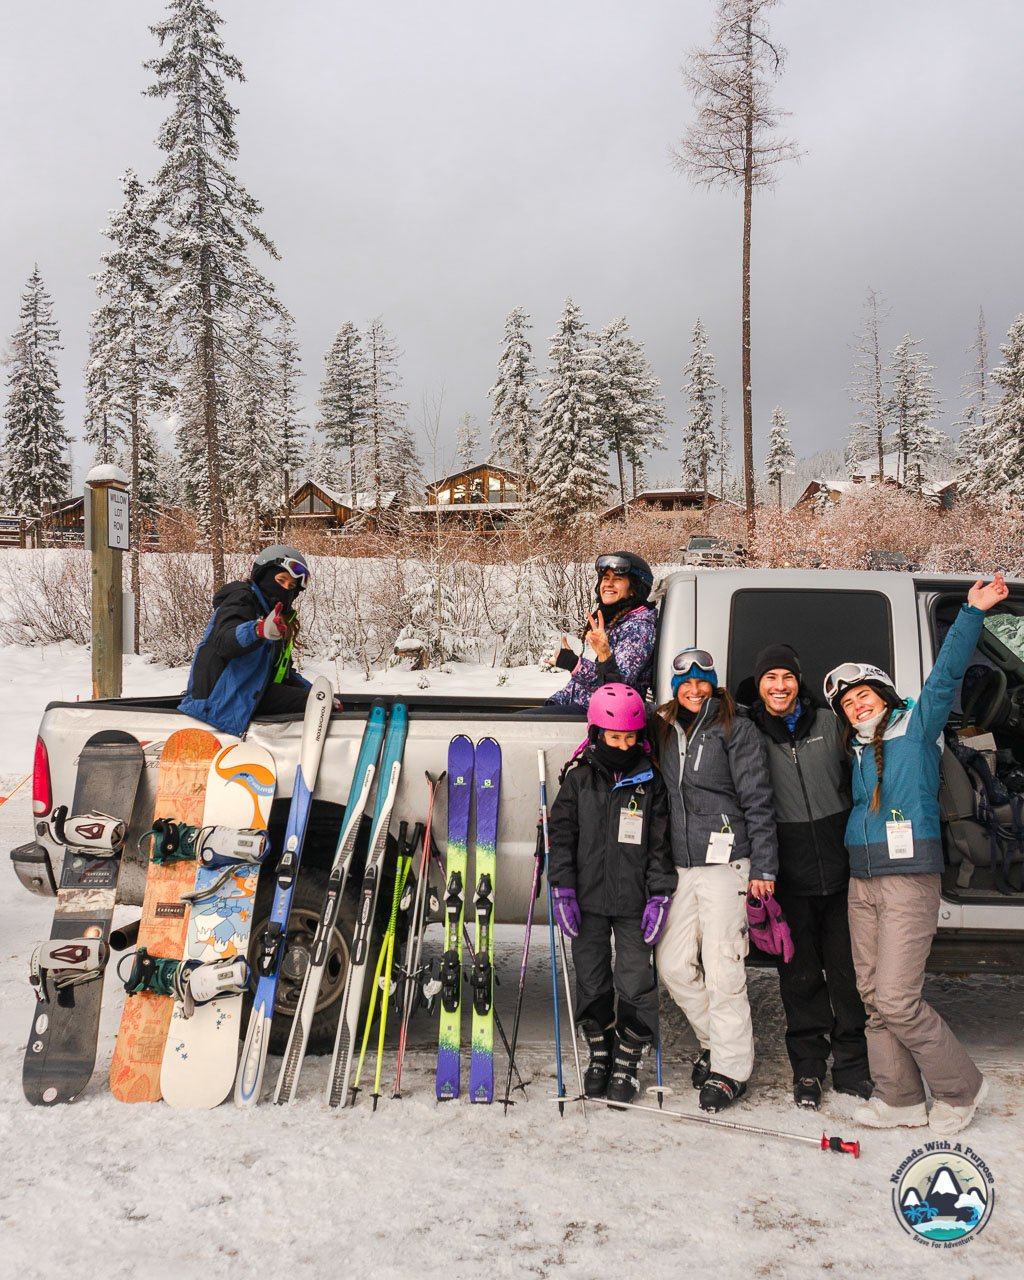 Whitefish Ski Resort, family skiing